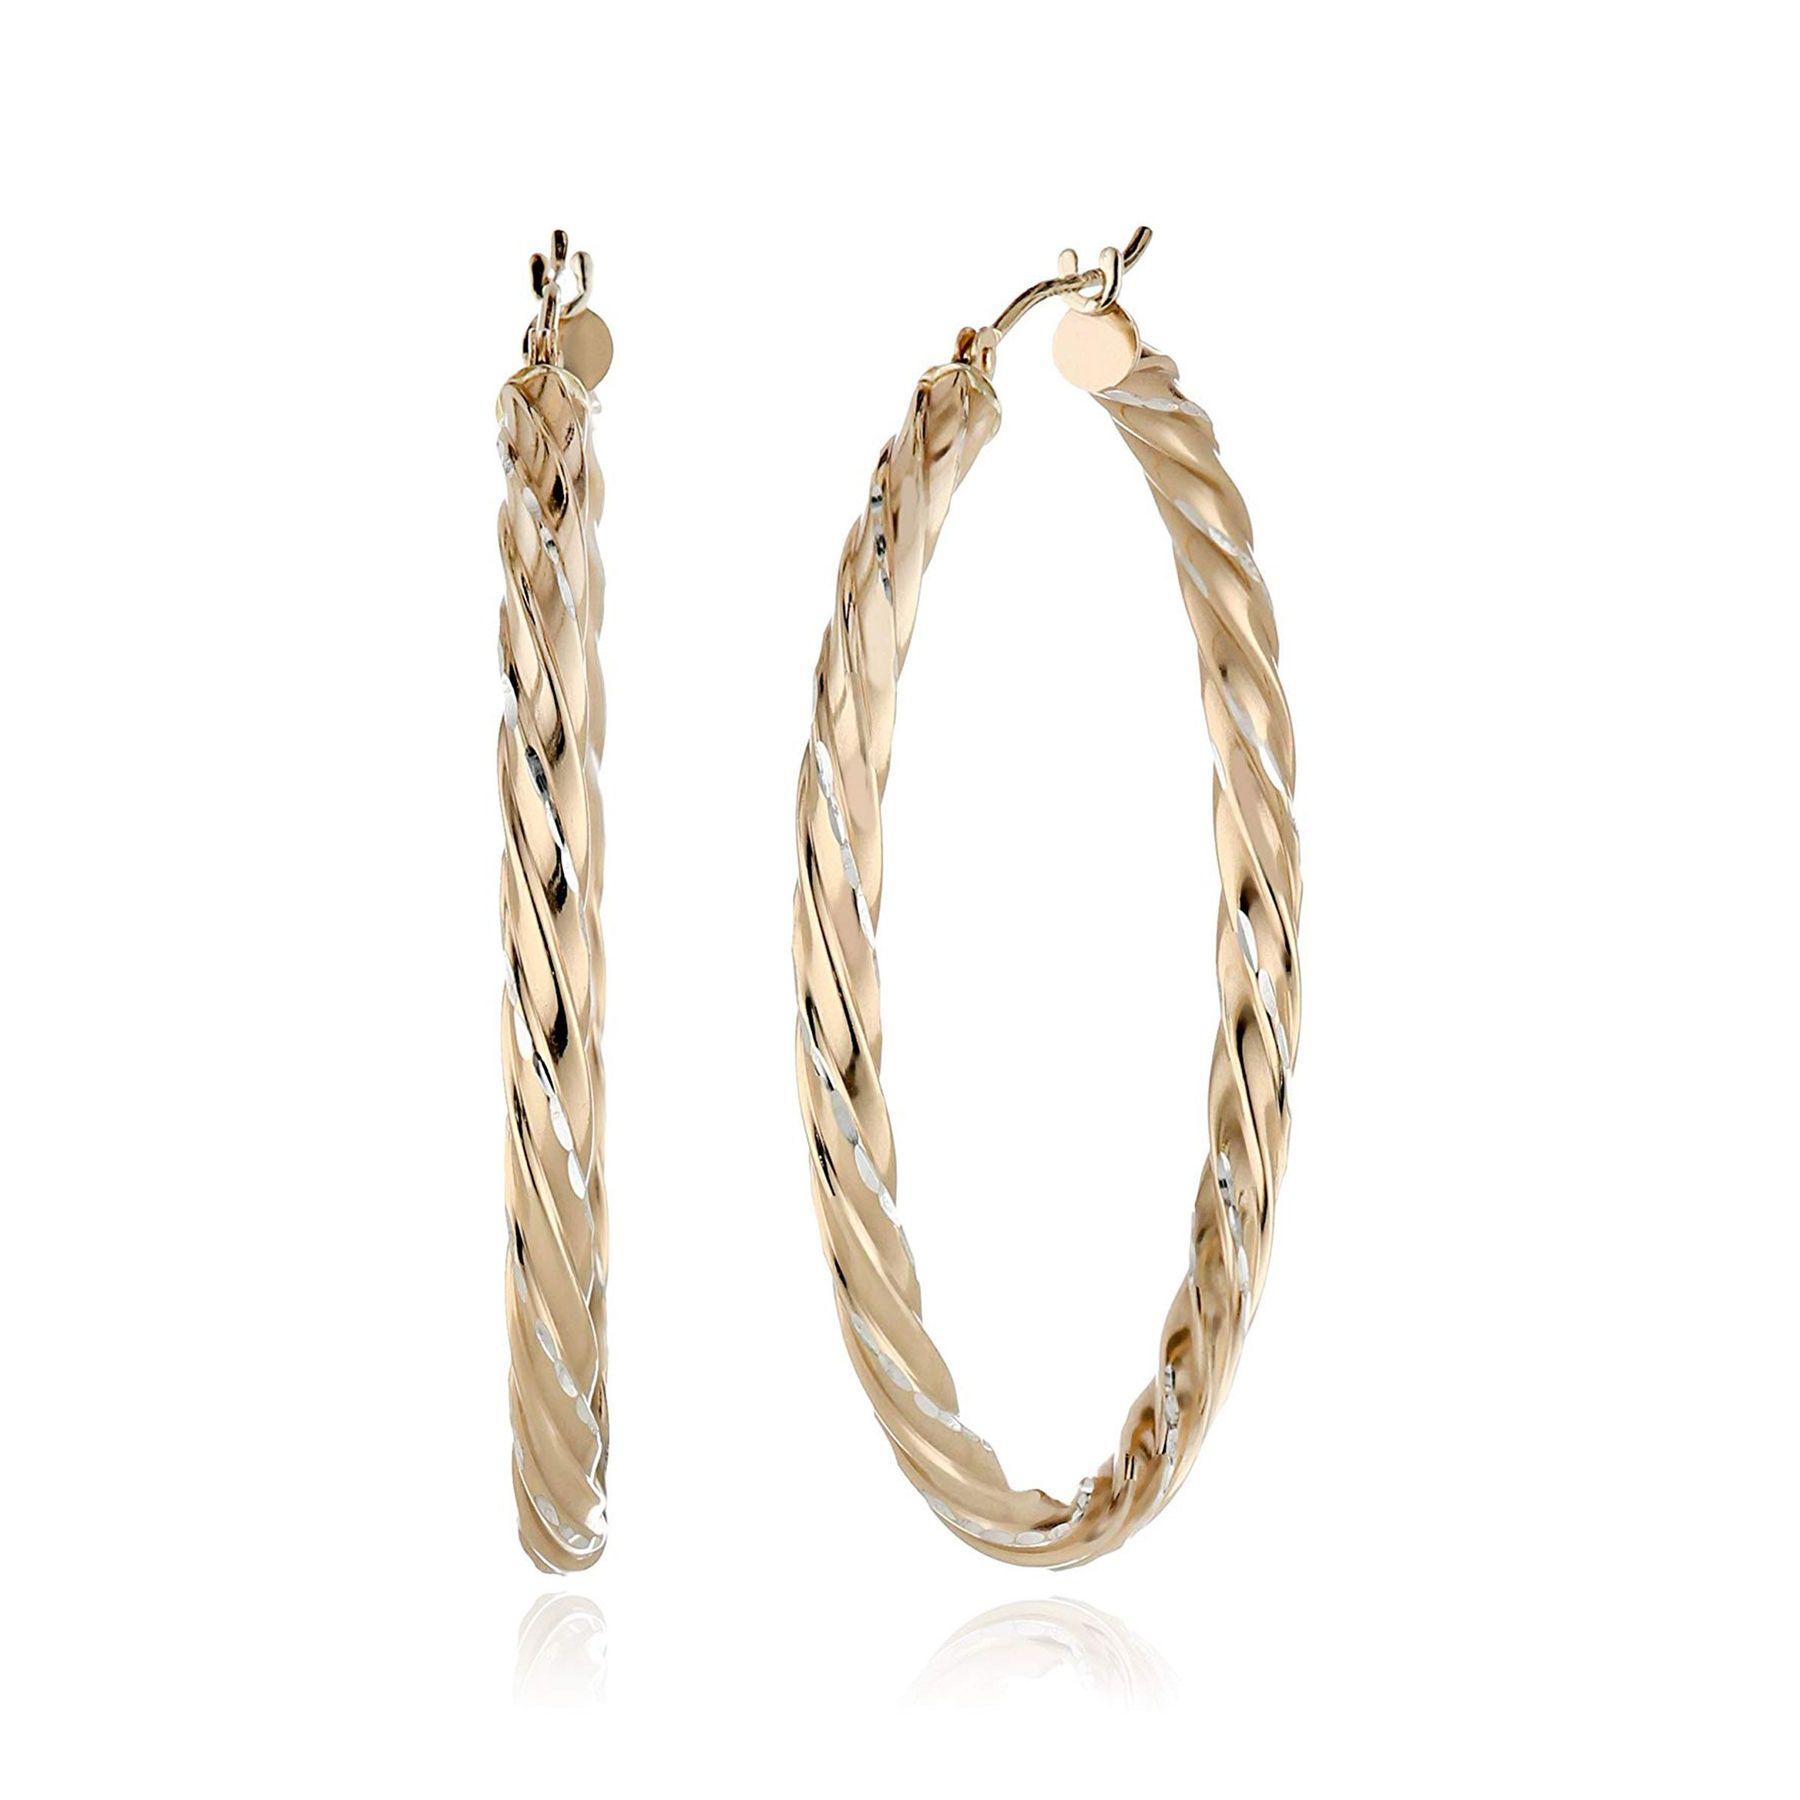 40 Mm Twisted Hoop Earrings In 14k Gold Bonded Sterling Silver